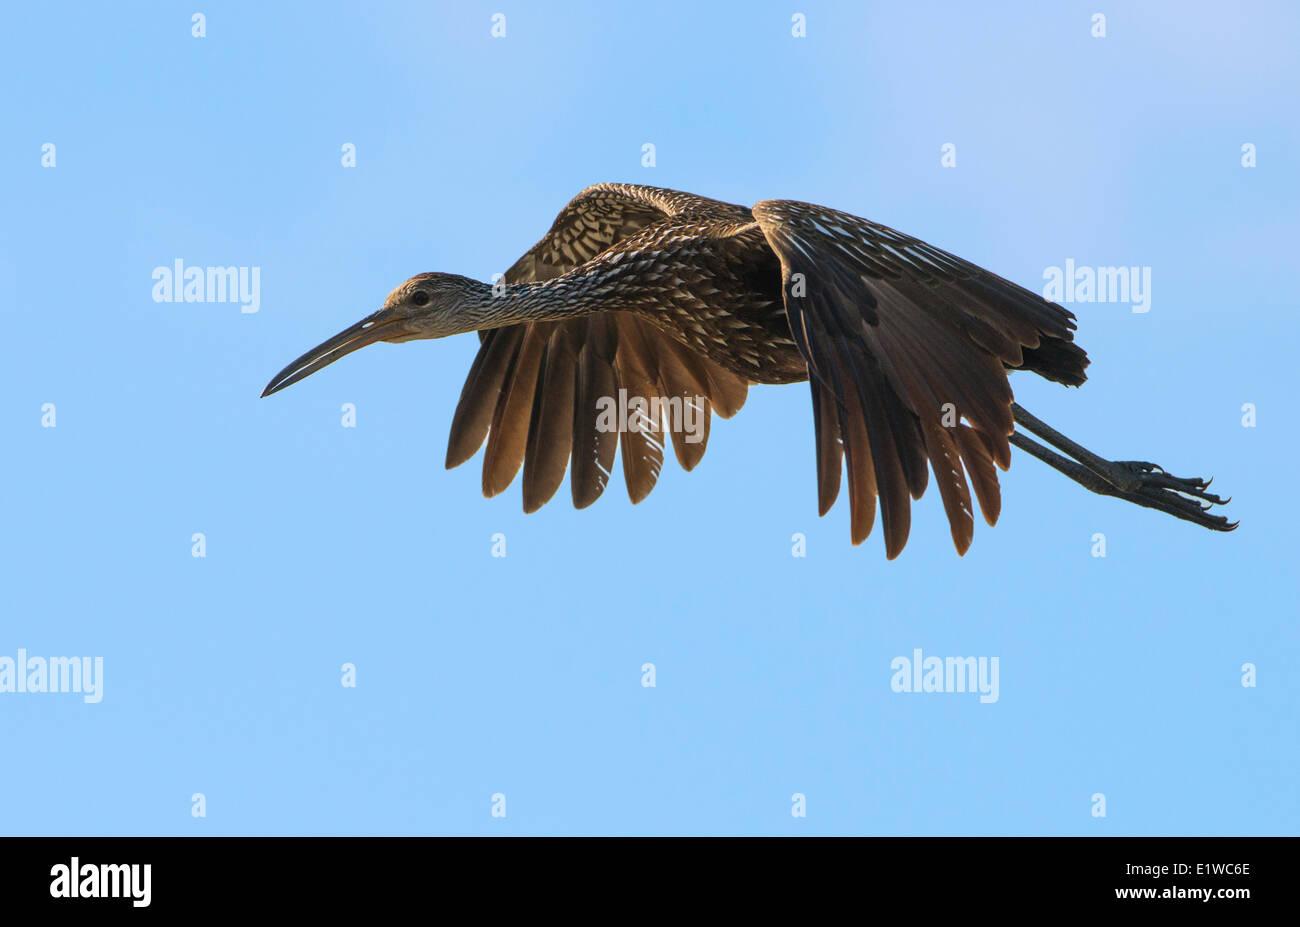 Limpkin (Aramus guarauna) - Circle B Bar Reserve, Florida - Stock Image